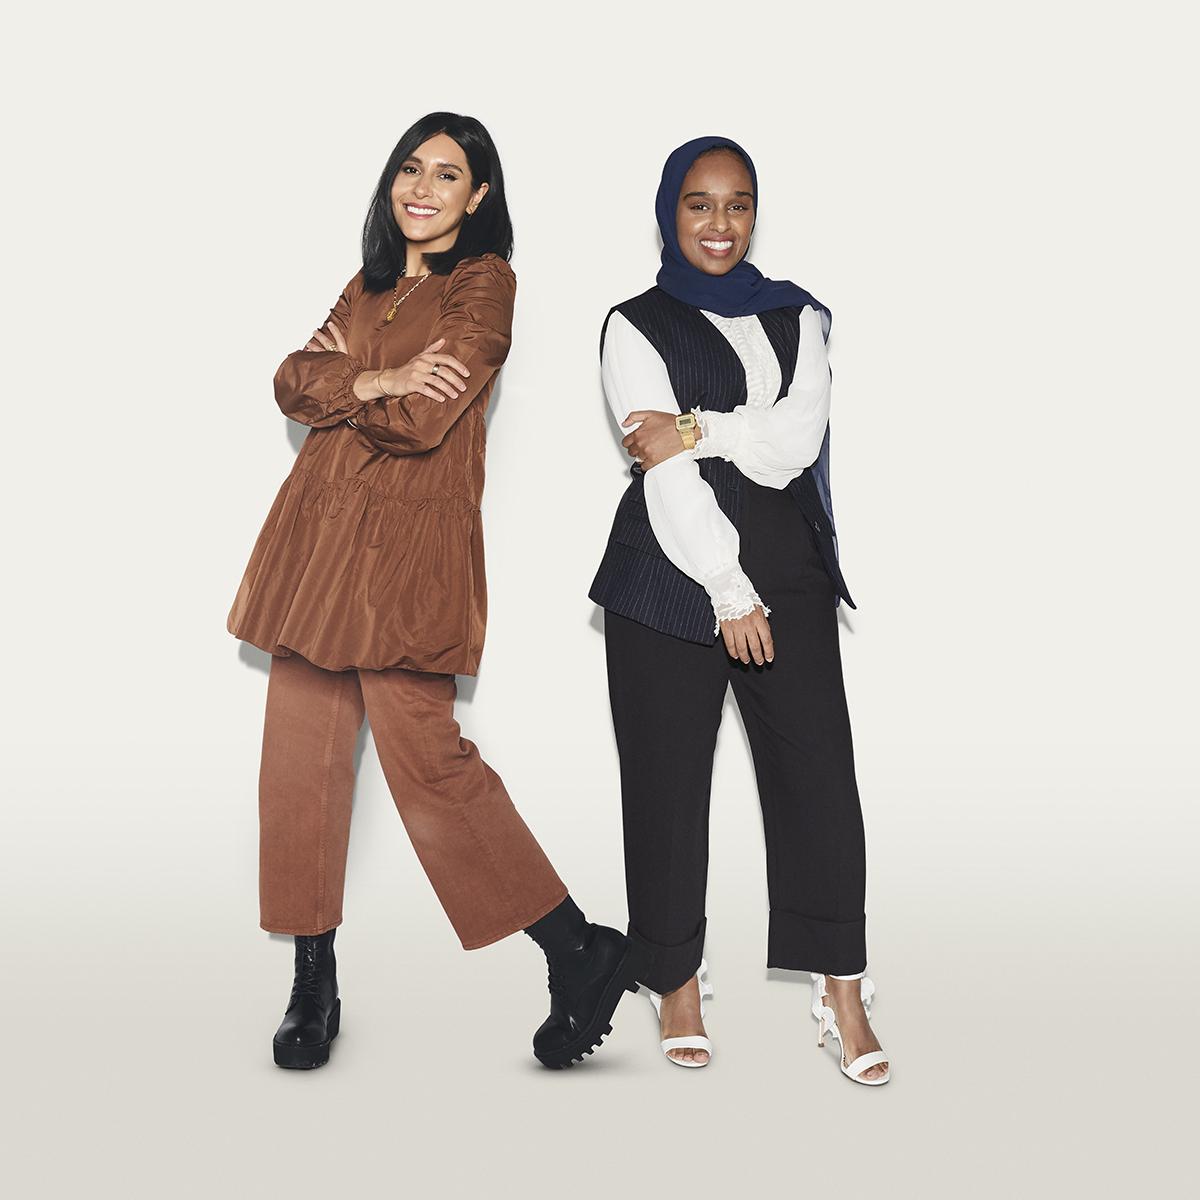 Dina Tokio and Dr Amina Yonis (credit: Henry J Kamara)